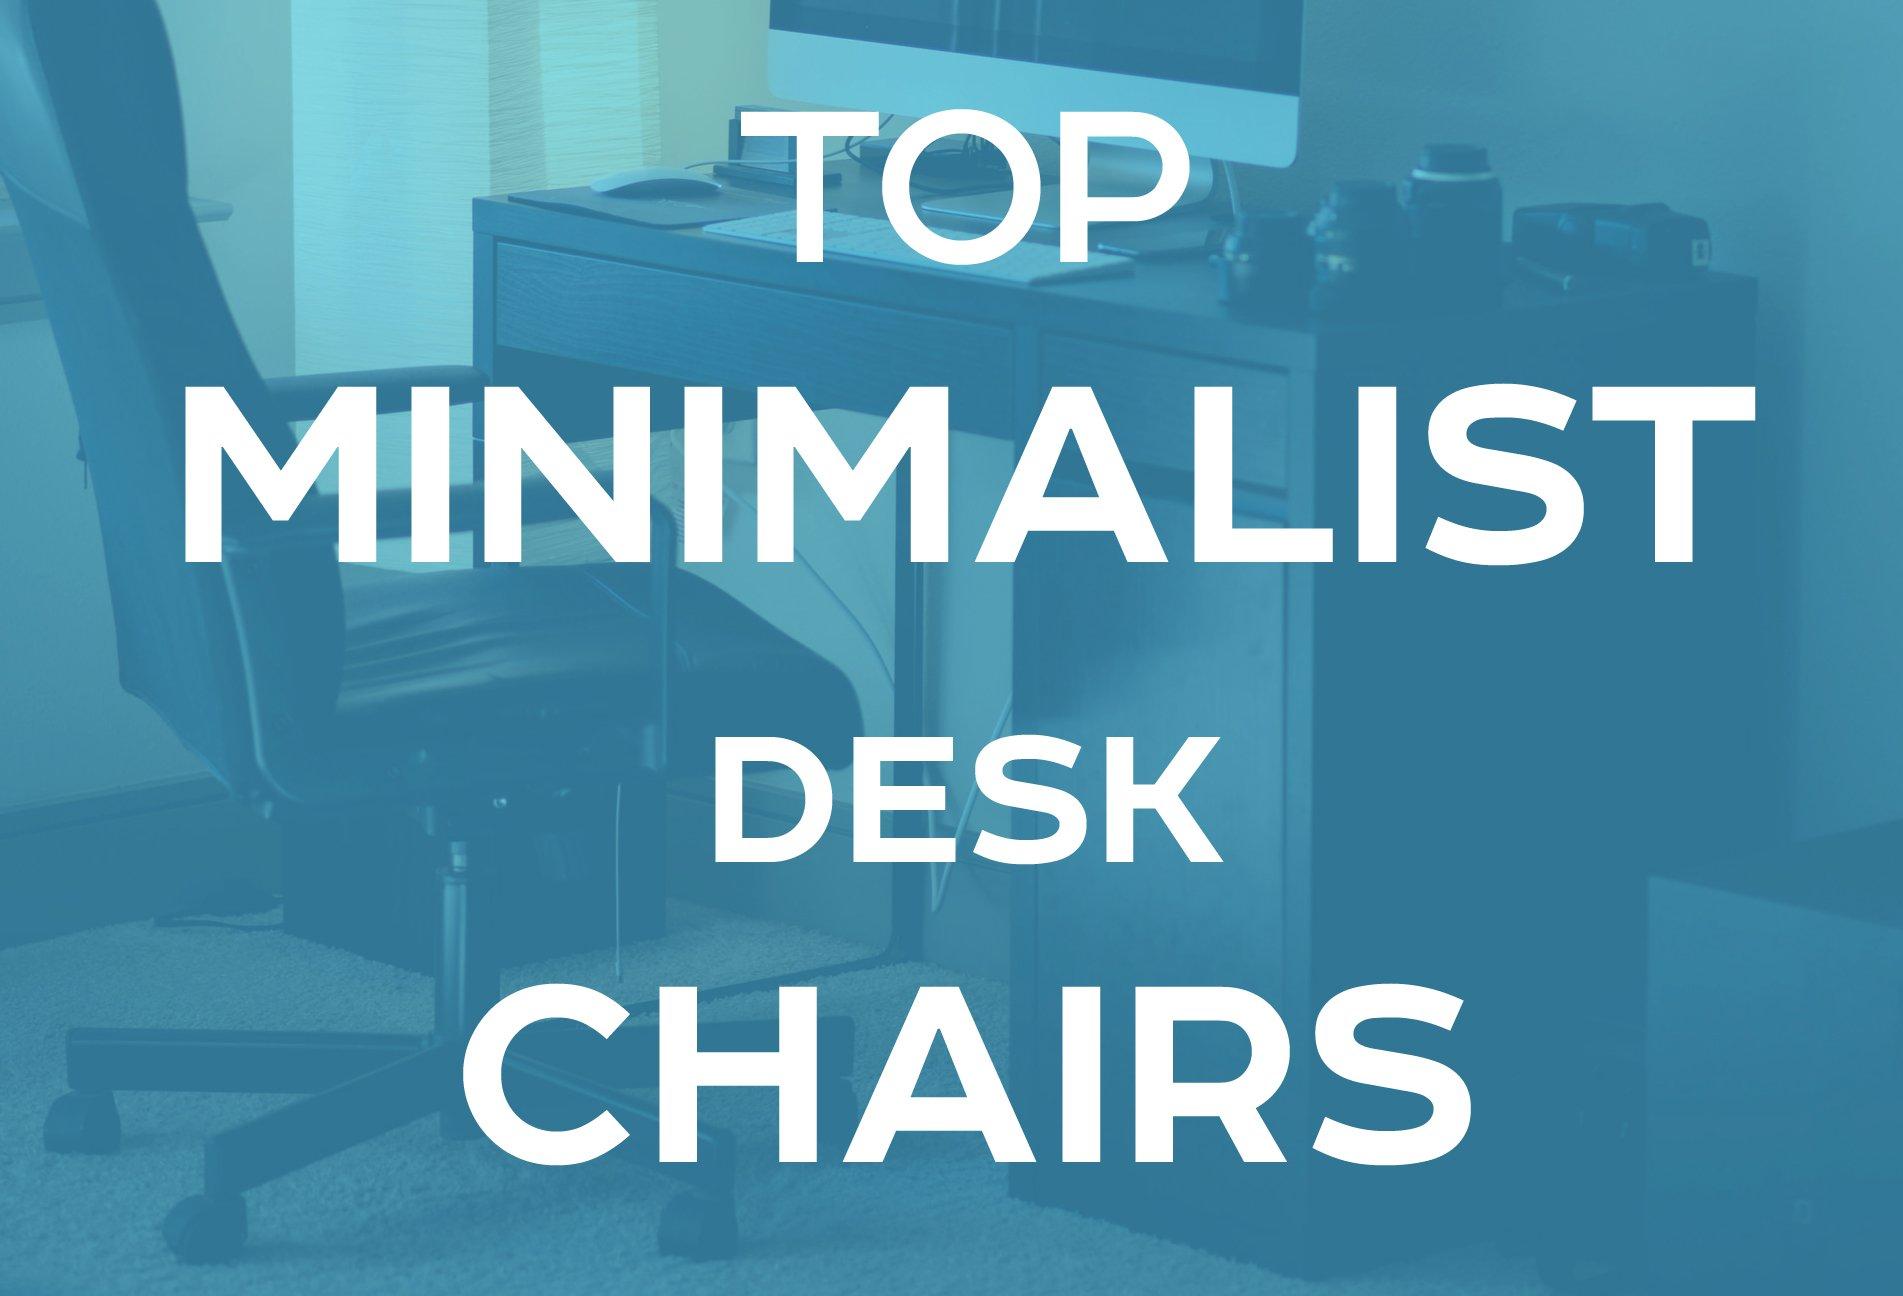 Top minimalist desk chair